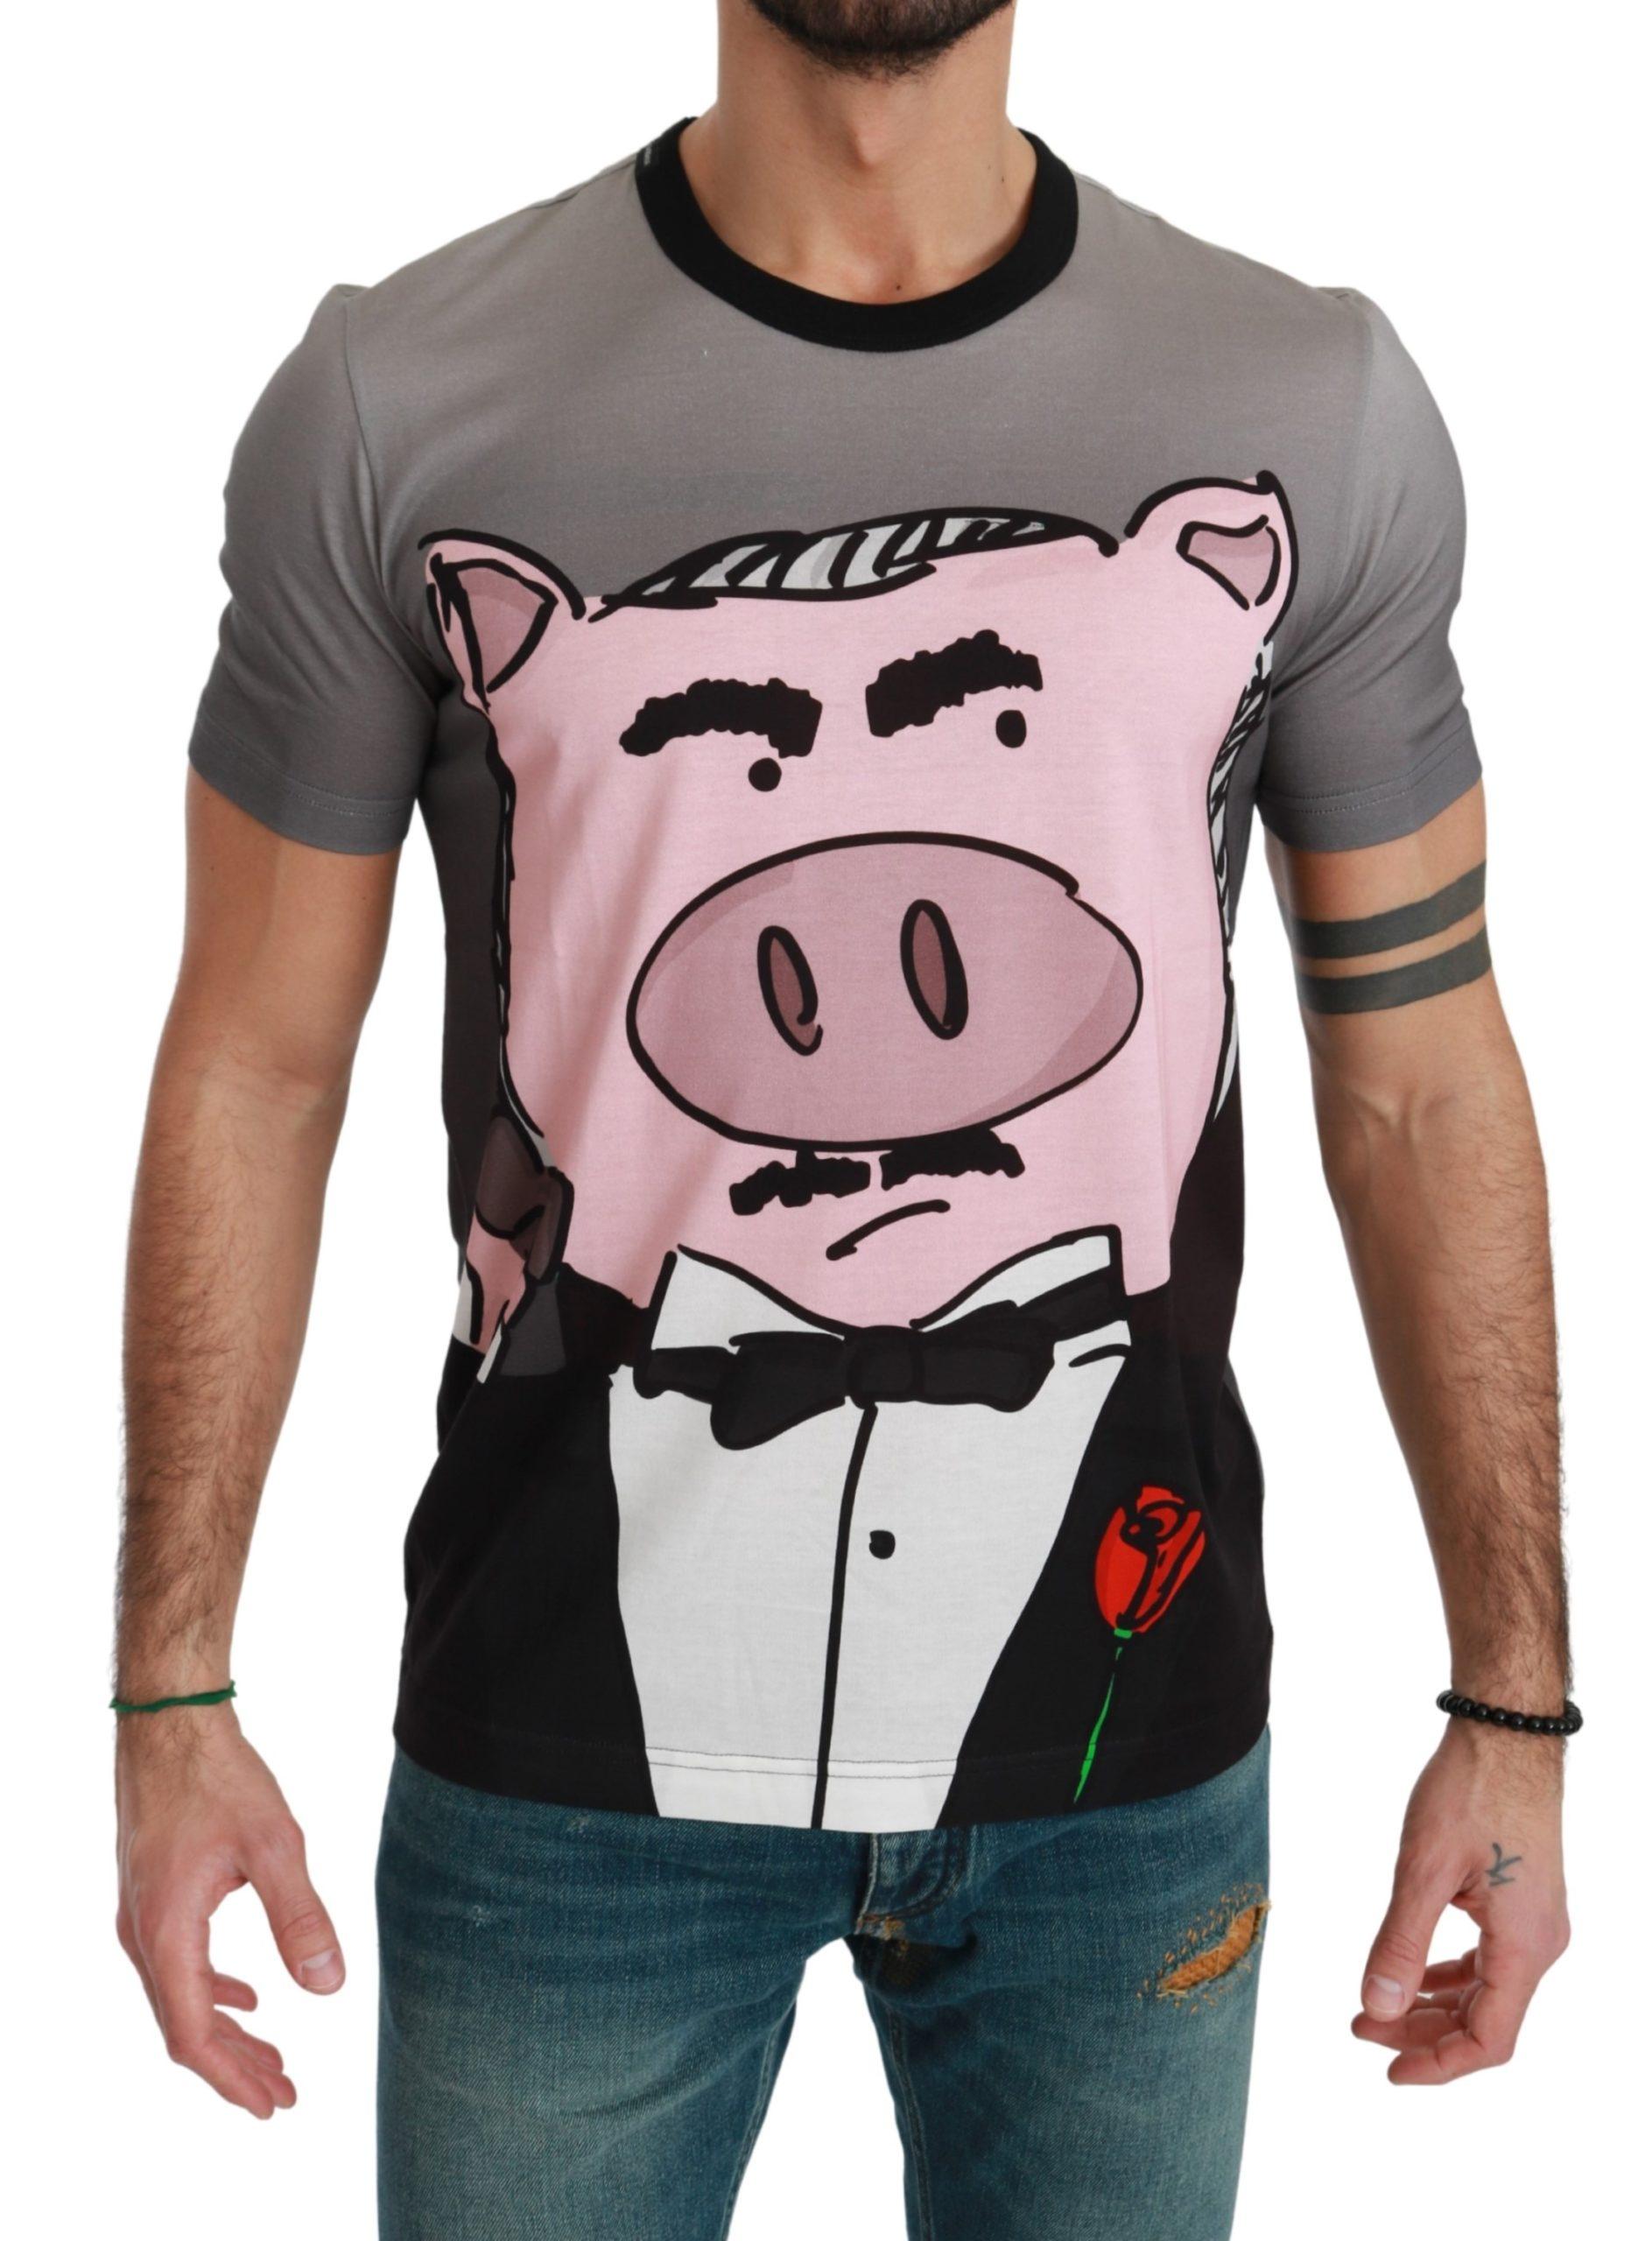 Dolce & Gabbana Men's Cotton Pig T-Shirt Gray TSH4551 - IT44 | XS